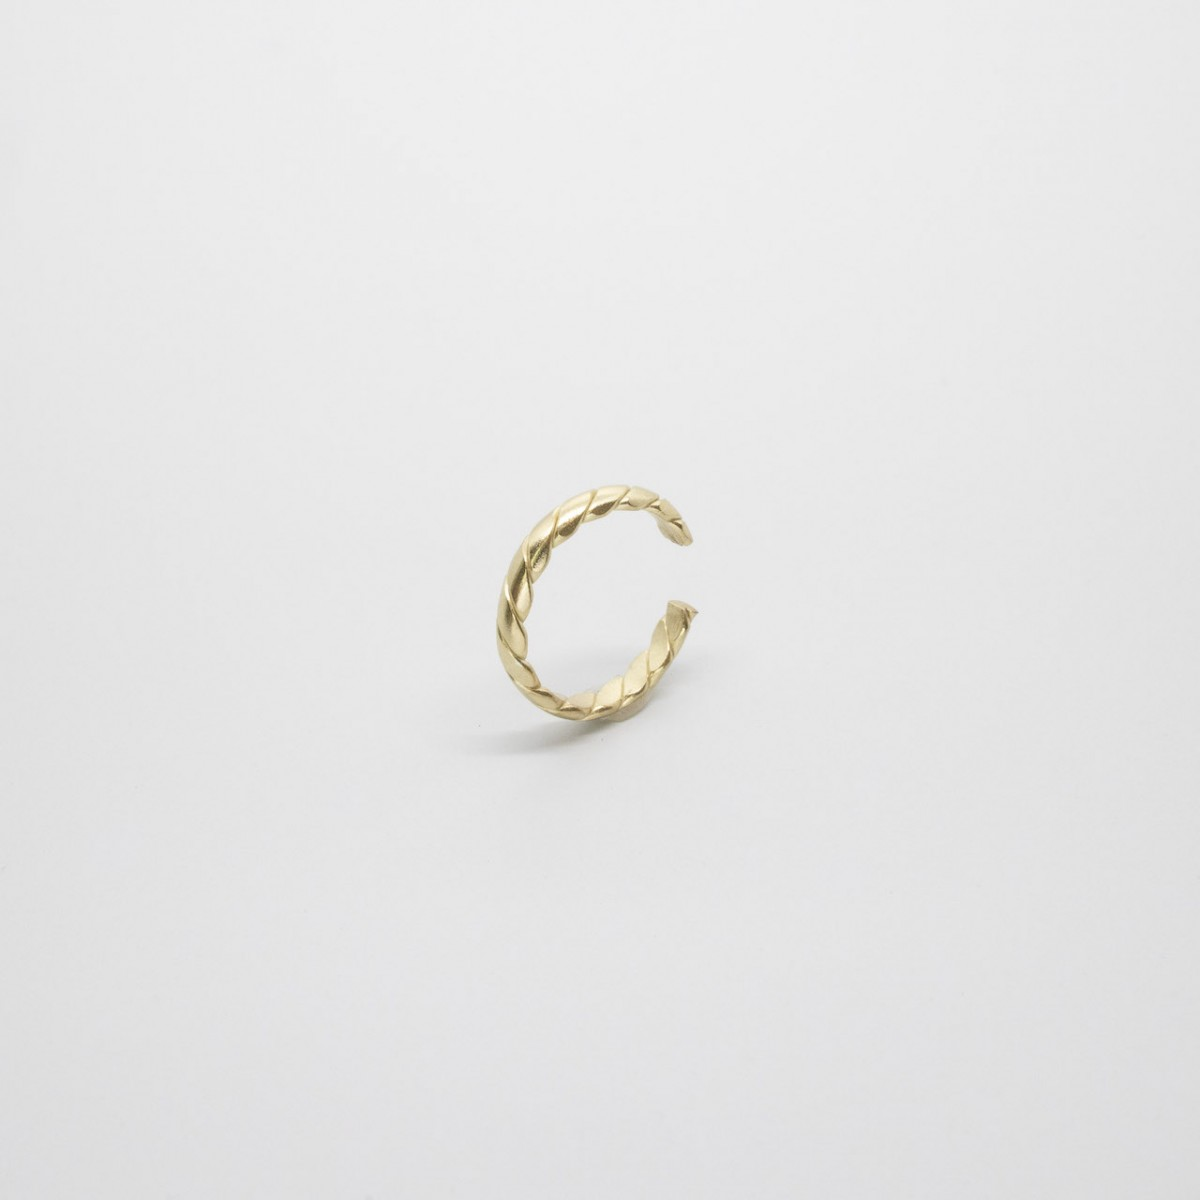 fejn jewelry - Braided Ear Cuff (einzeln)